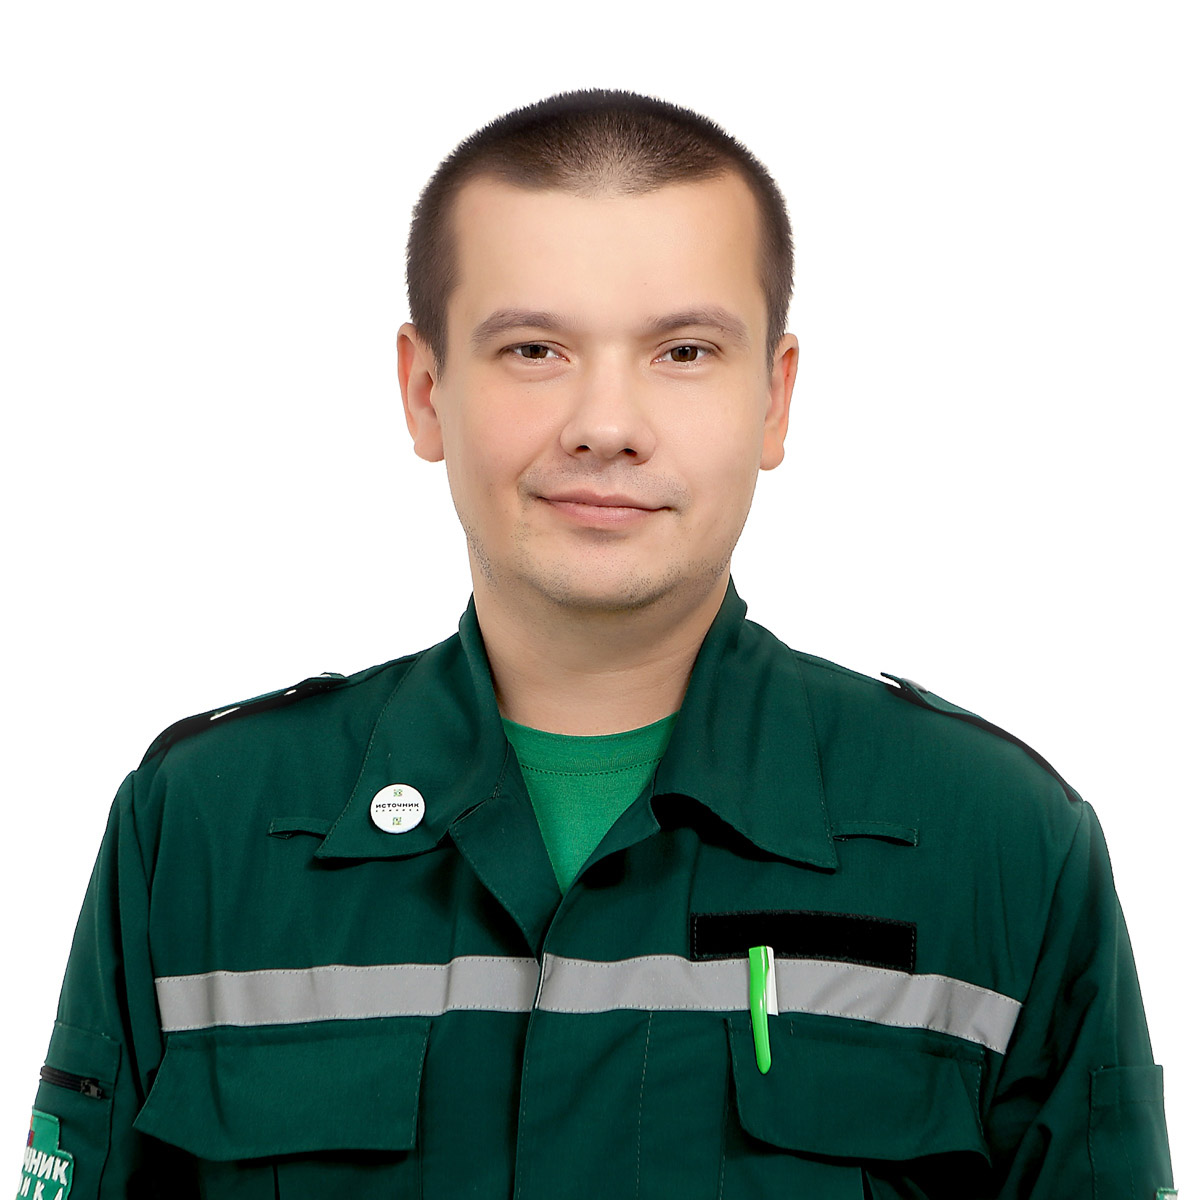 Морозов Алексей Владимирович